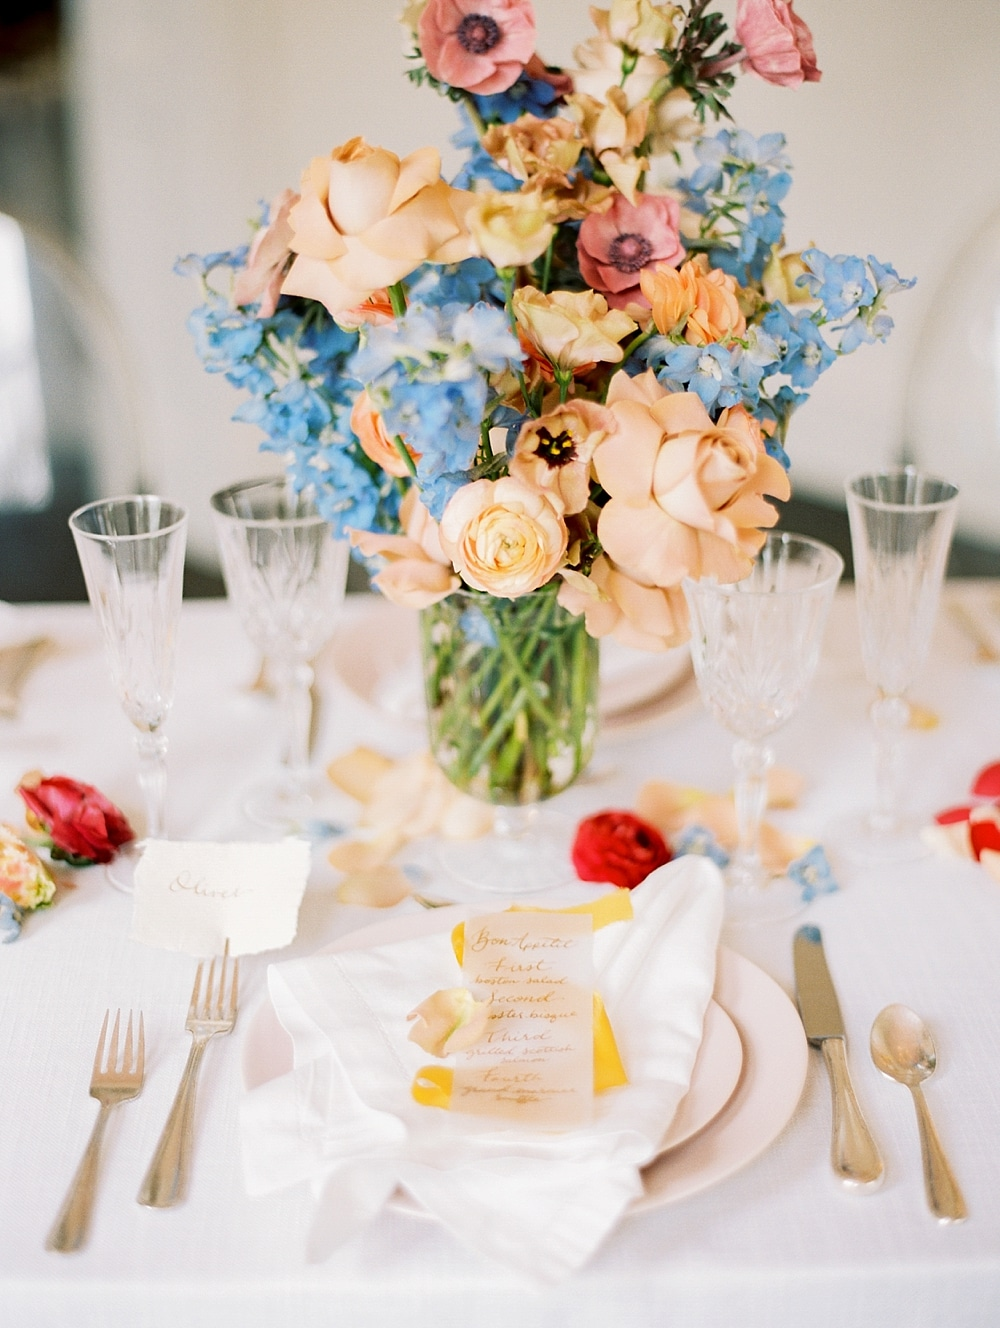 kristin-la-voie-photography-austin-wedding-photographer-woodbine-mansion-12